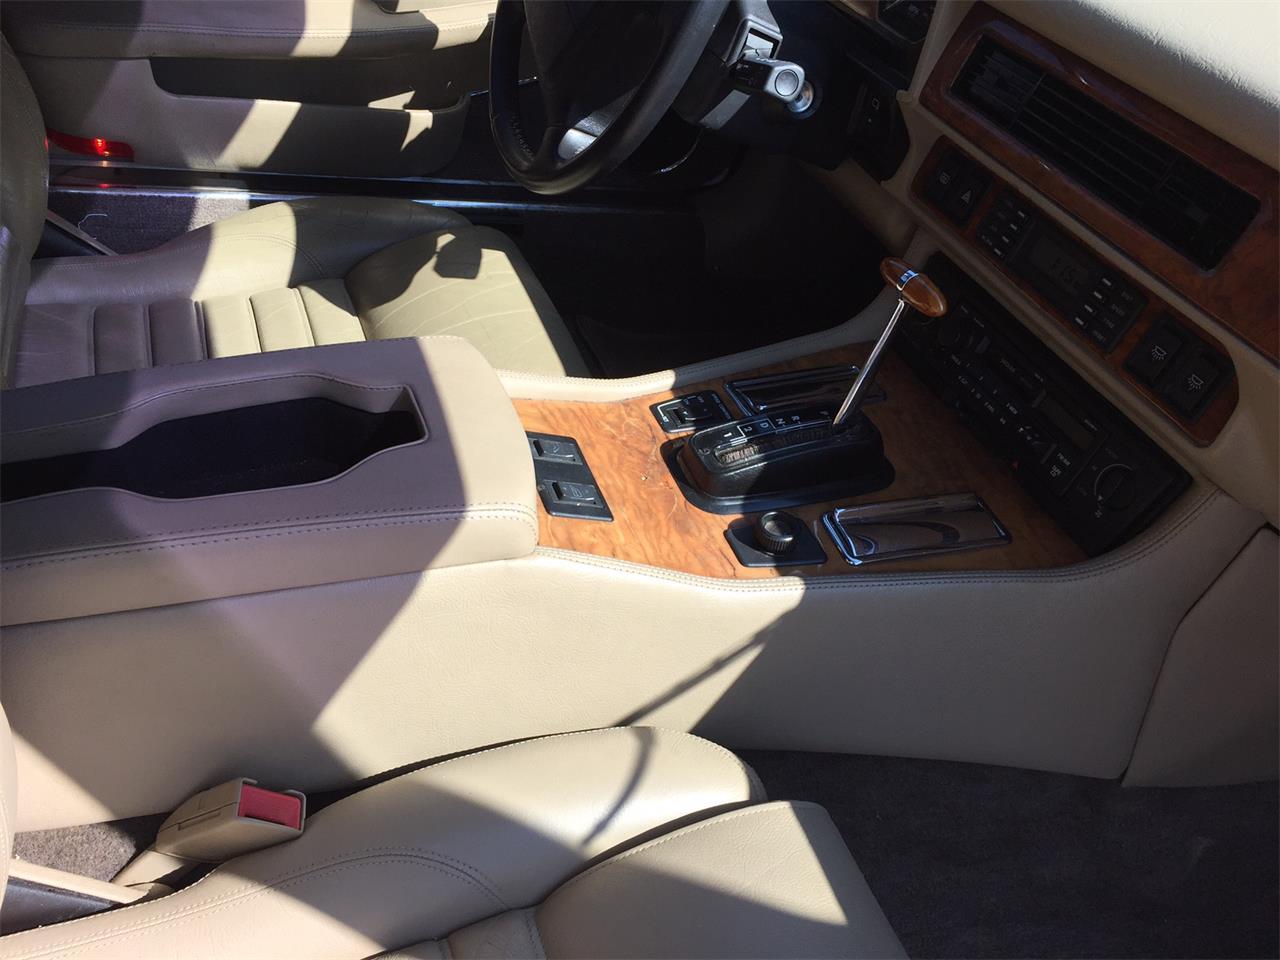 Large Picture of '92 Jaguar XJS located in Effingham Illinois - $6,900.00 - JGHZ